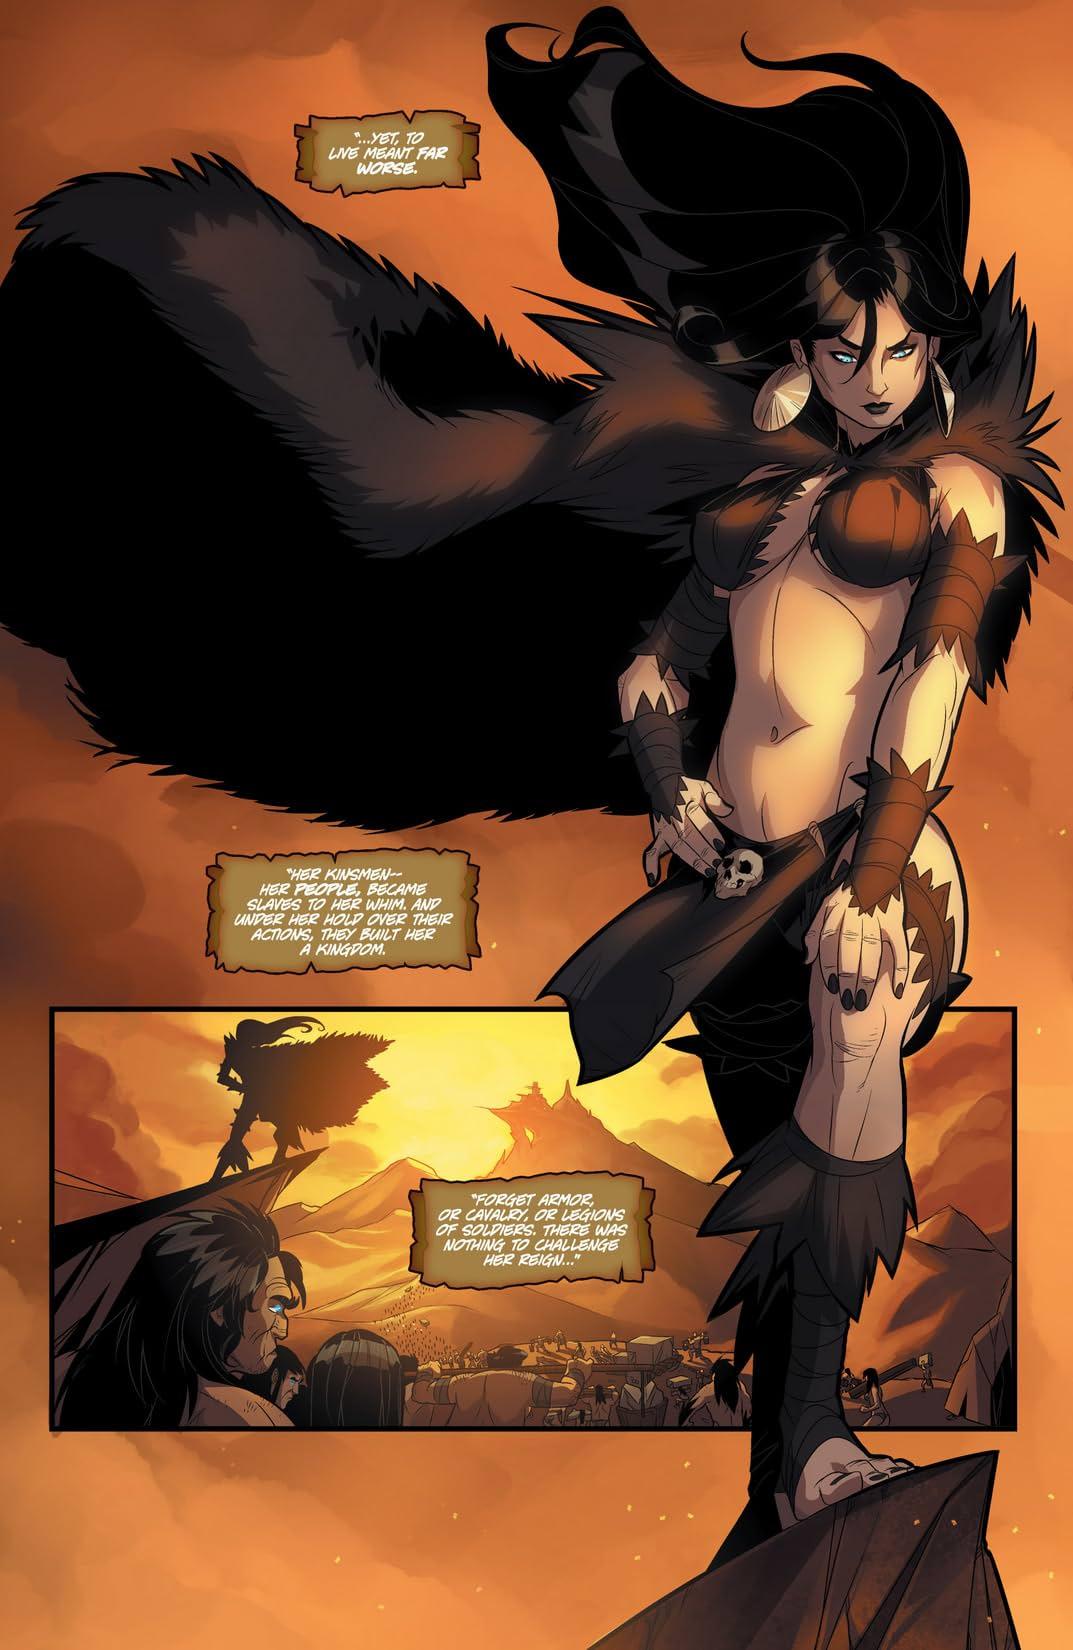 Charismagic: The Death Princess #1